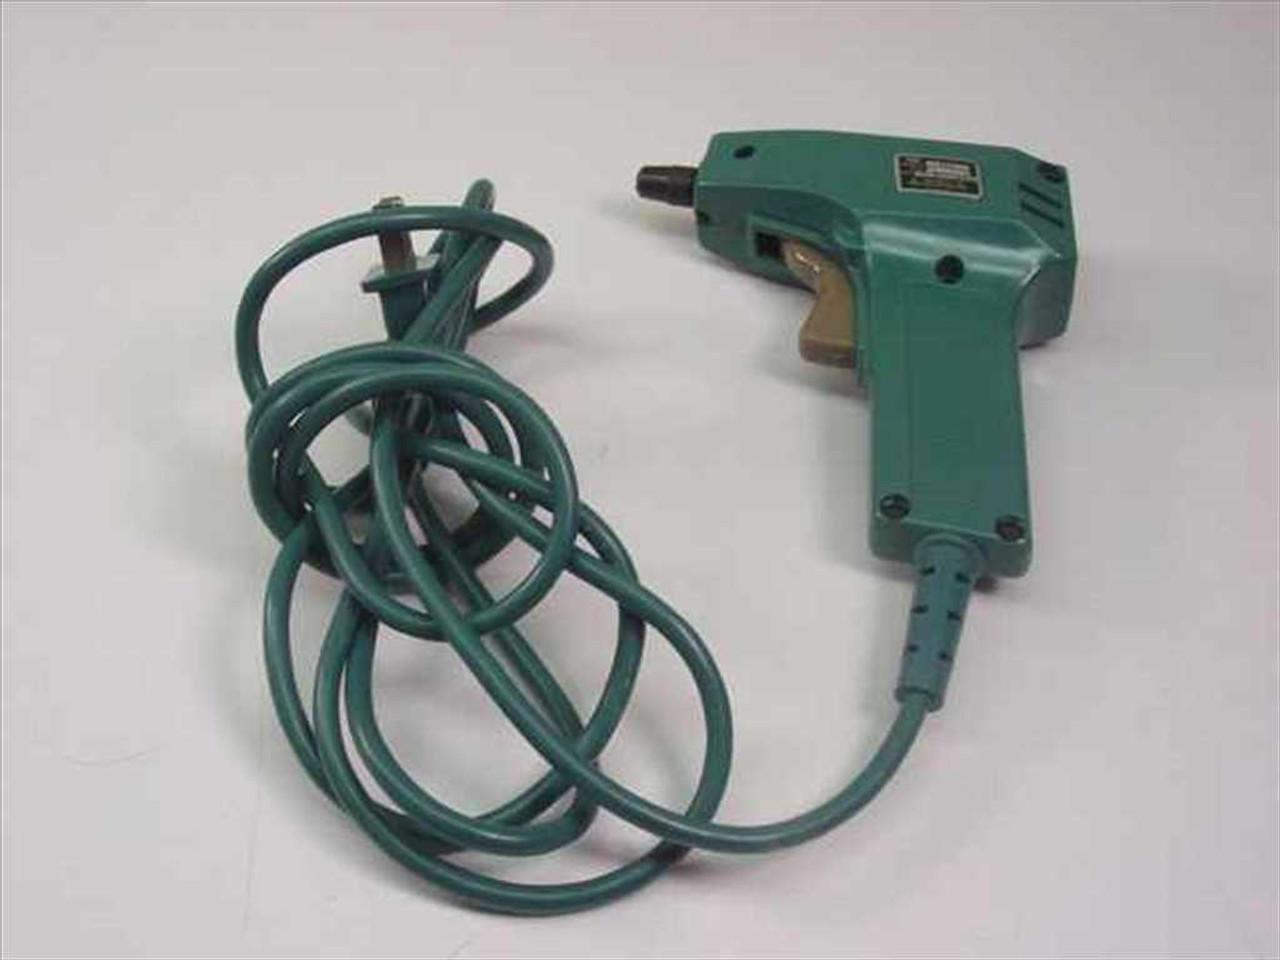 OK Industries EW-8 Wire Strap Tool Gun | RecycledGoods.com